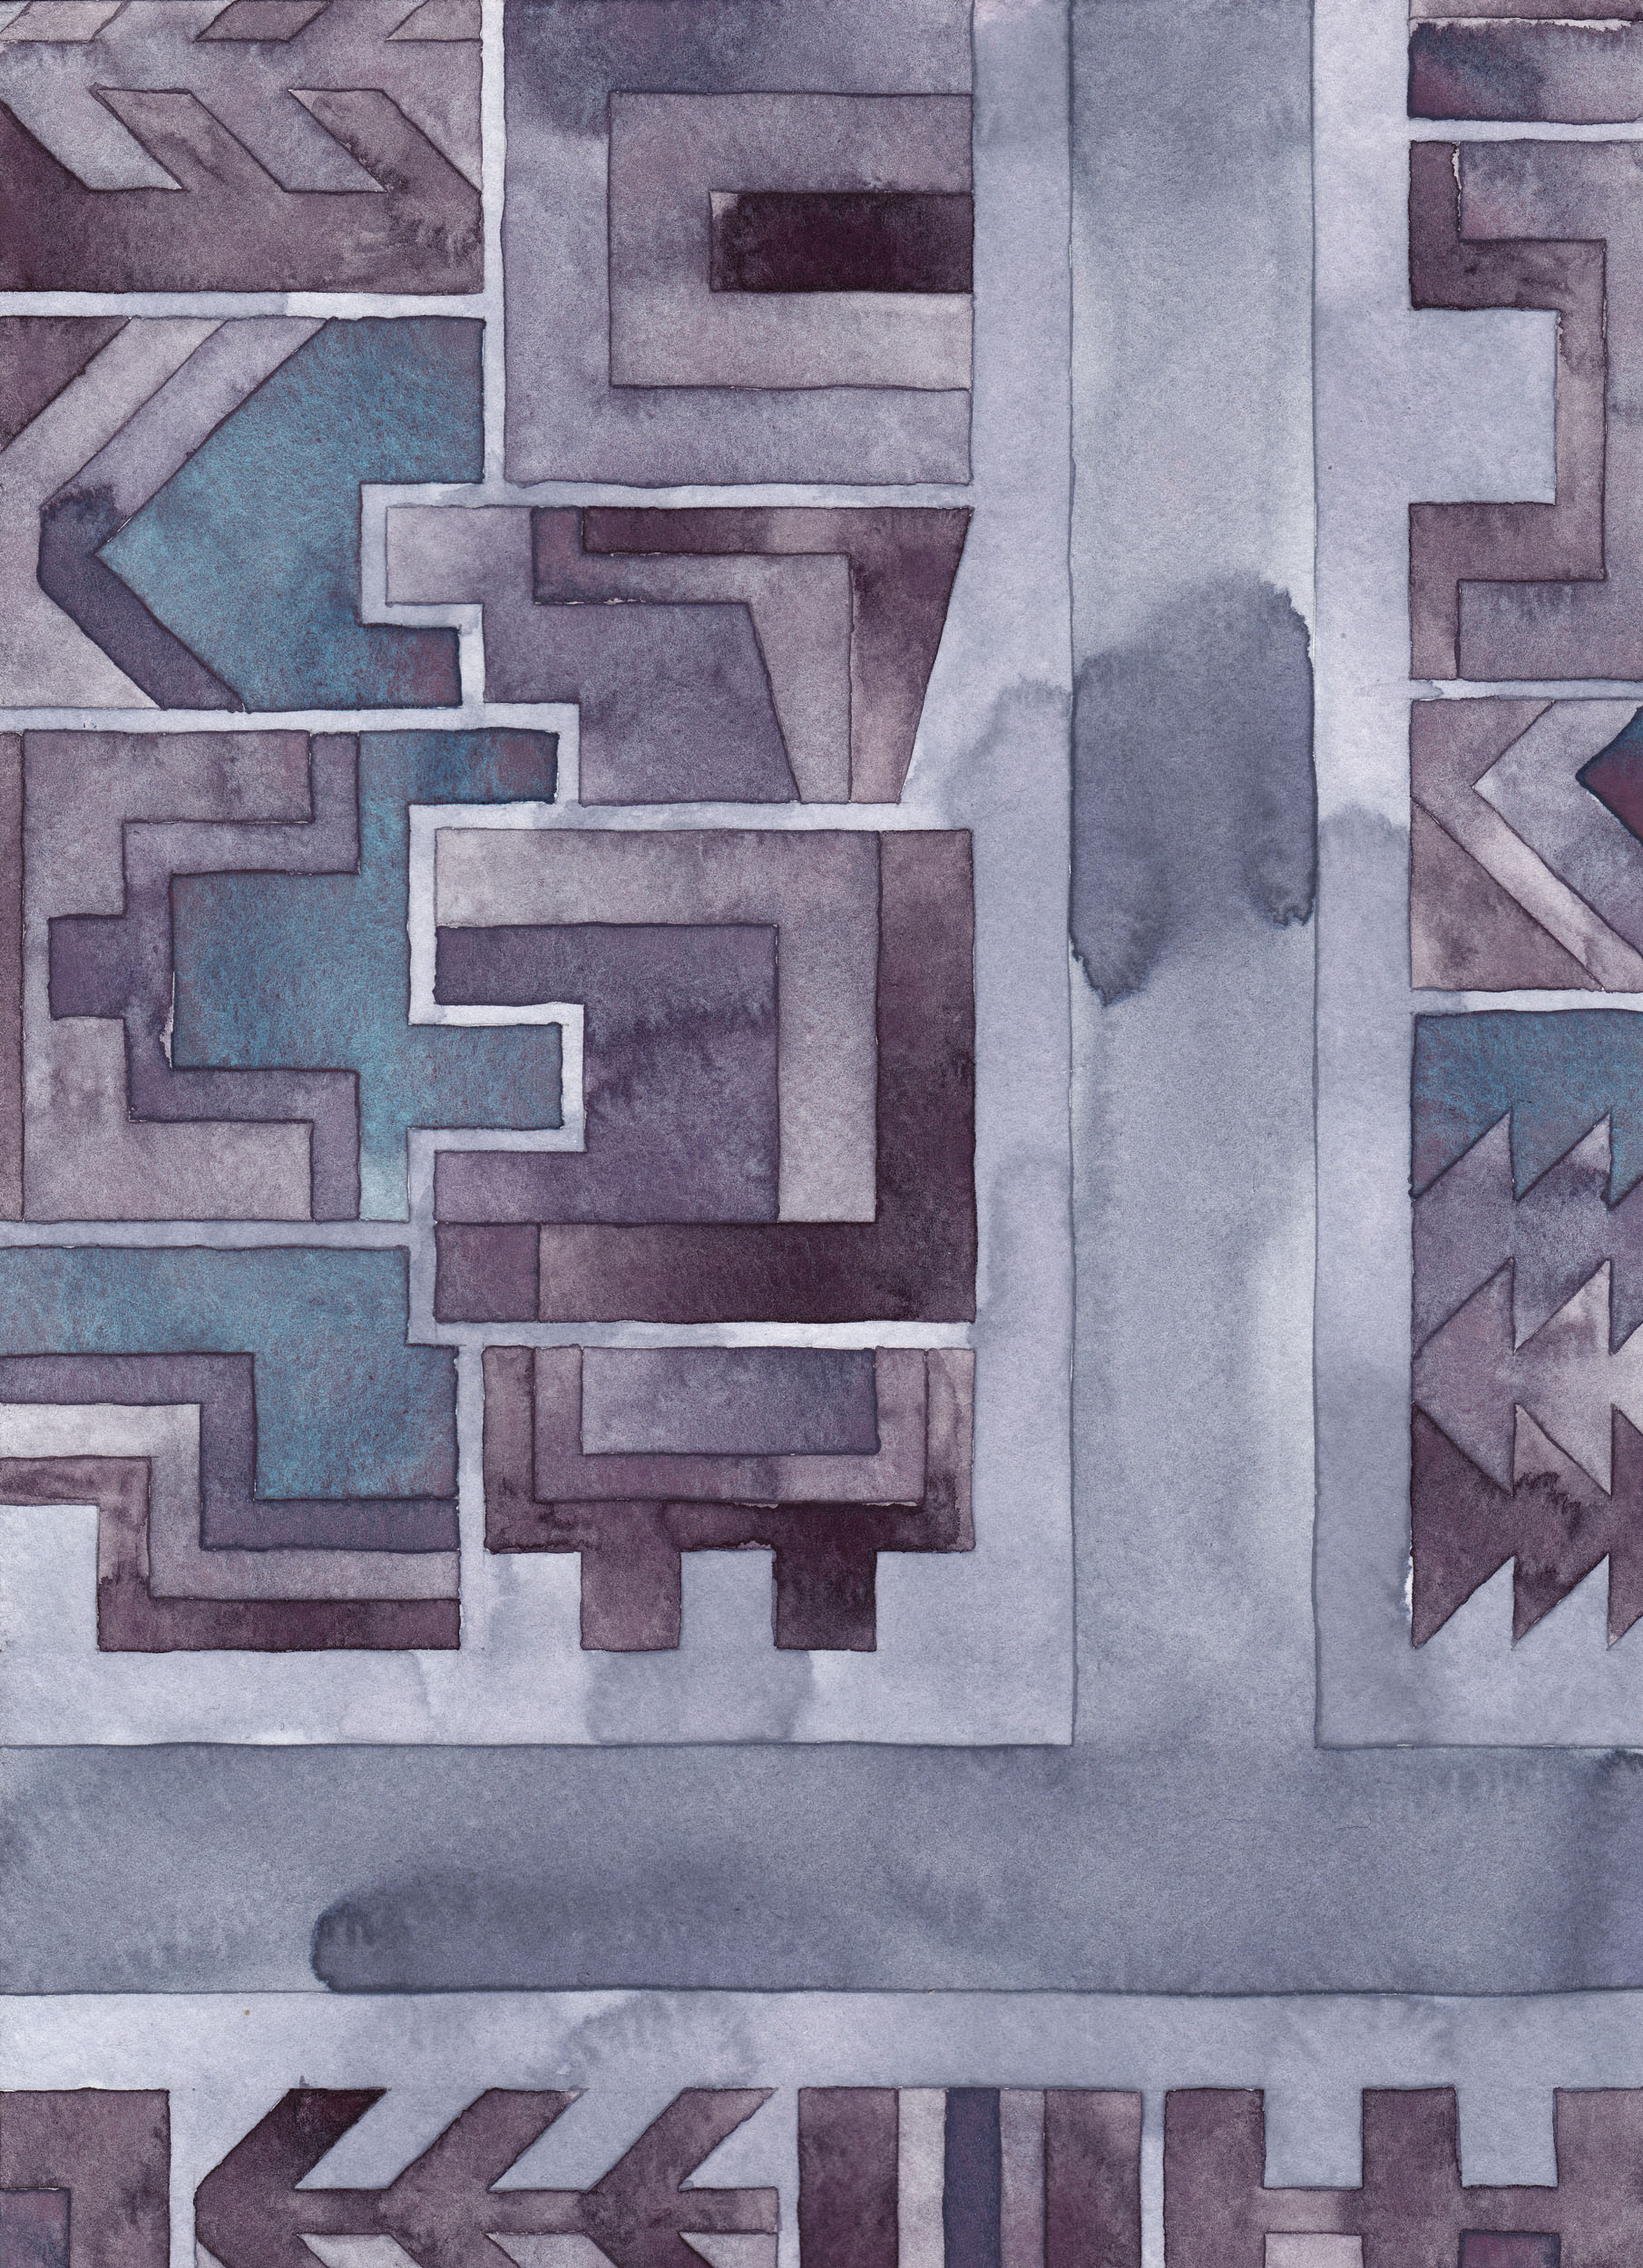 Cityscape 18 , 2014  watercolor on watercolor paper  11.75 x 8.5 in